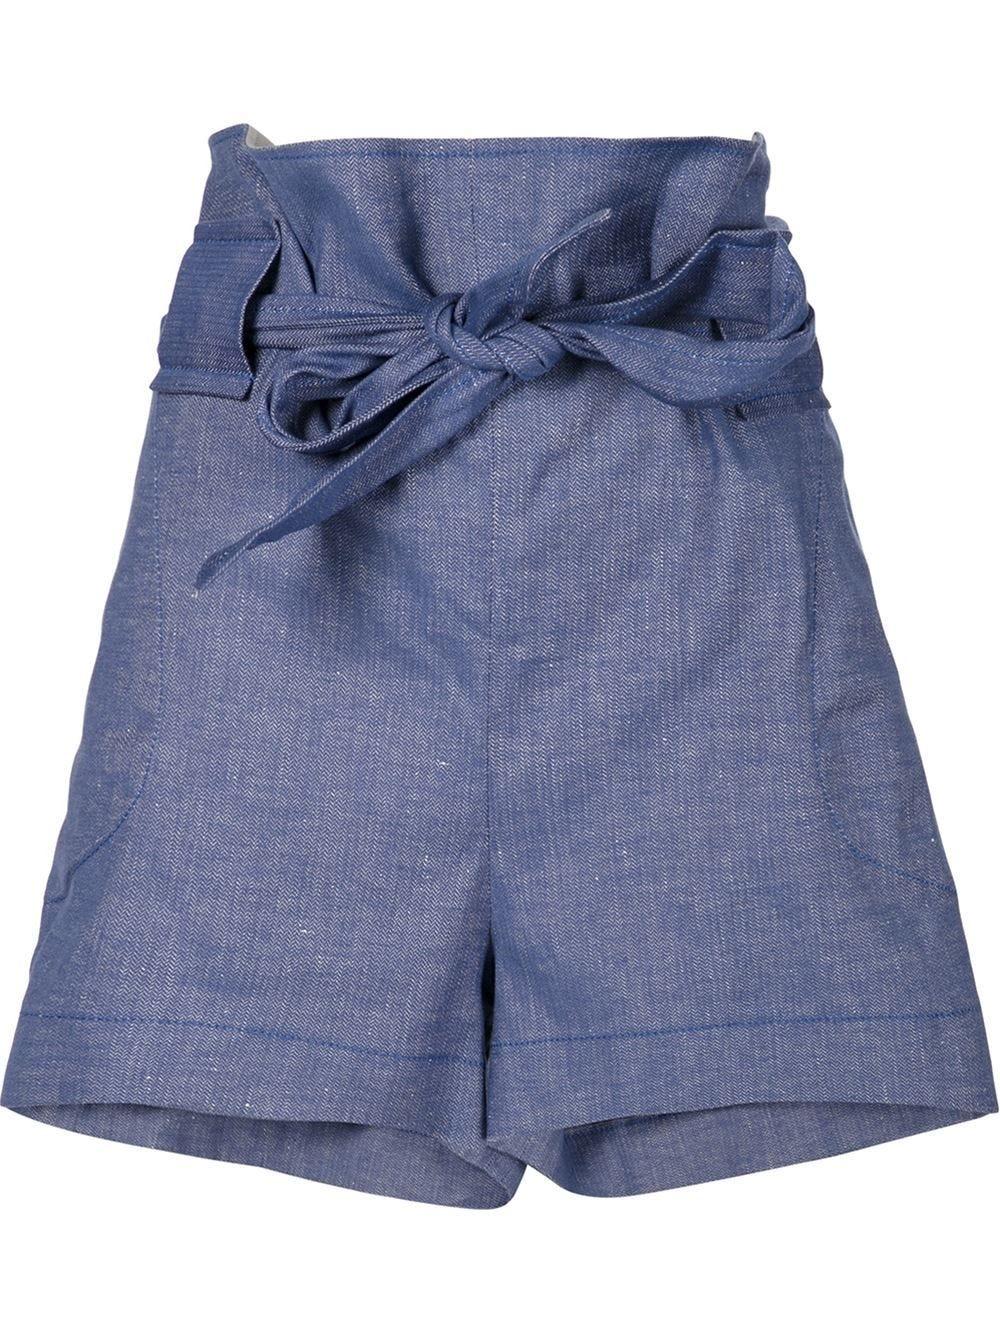 High-Waisted Shorts - Denim Shorts, Trend, Flattering